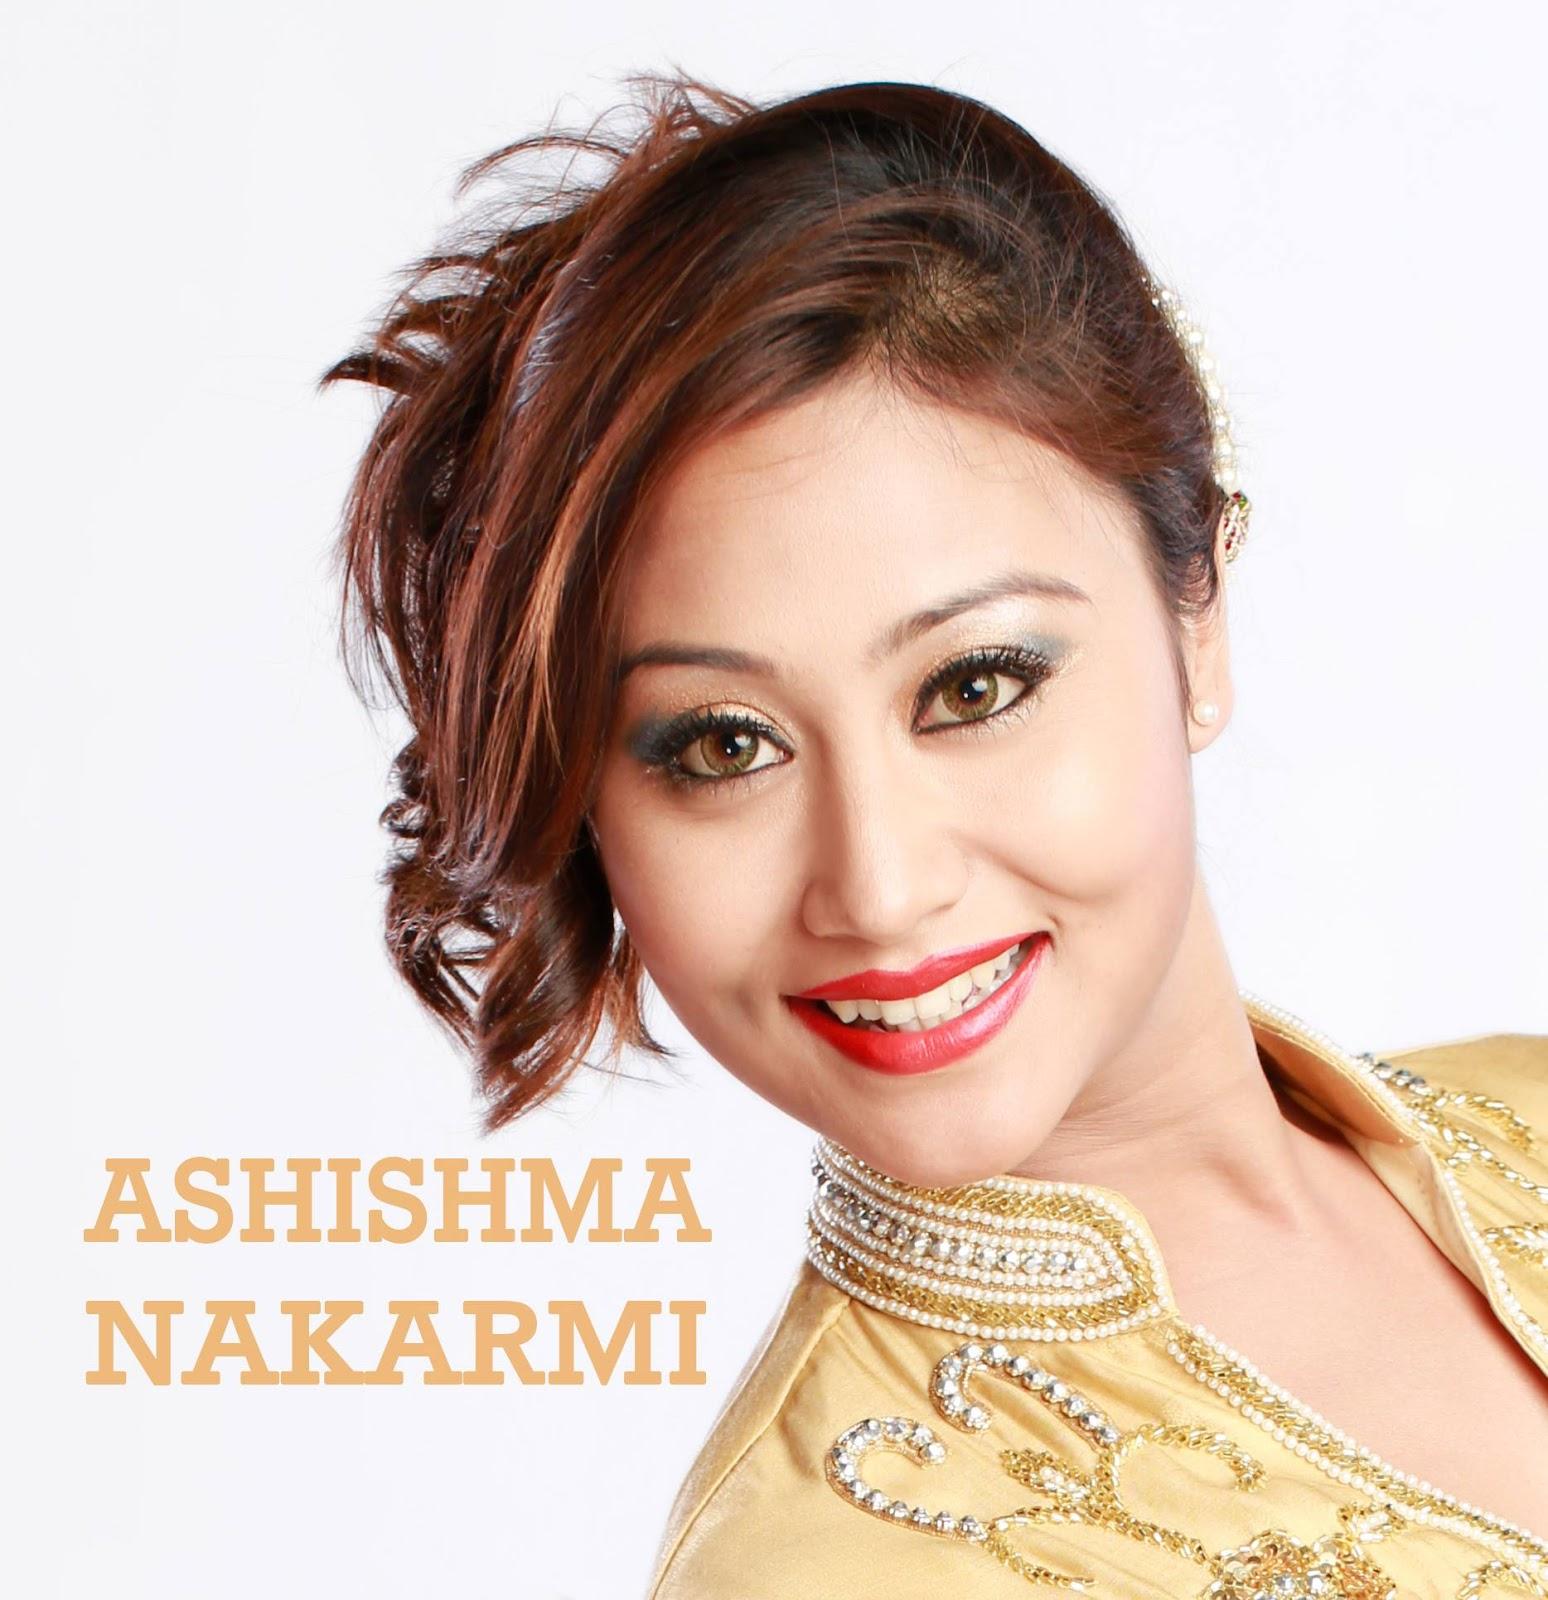 ashishma nakarmi biography of albert